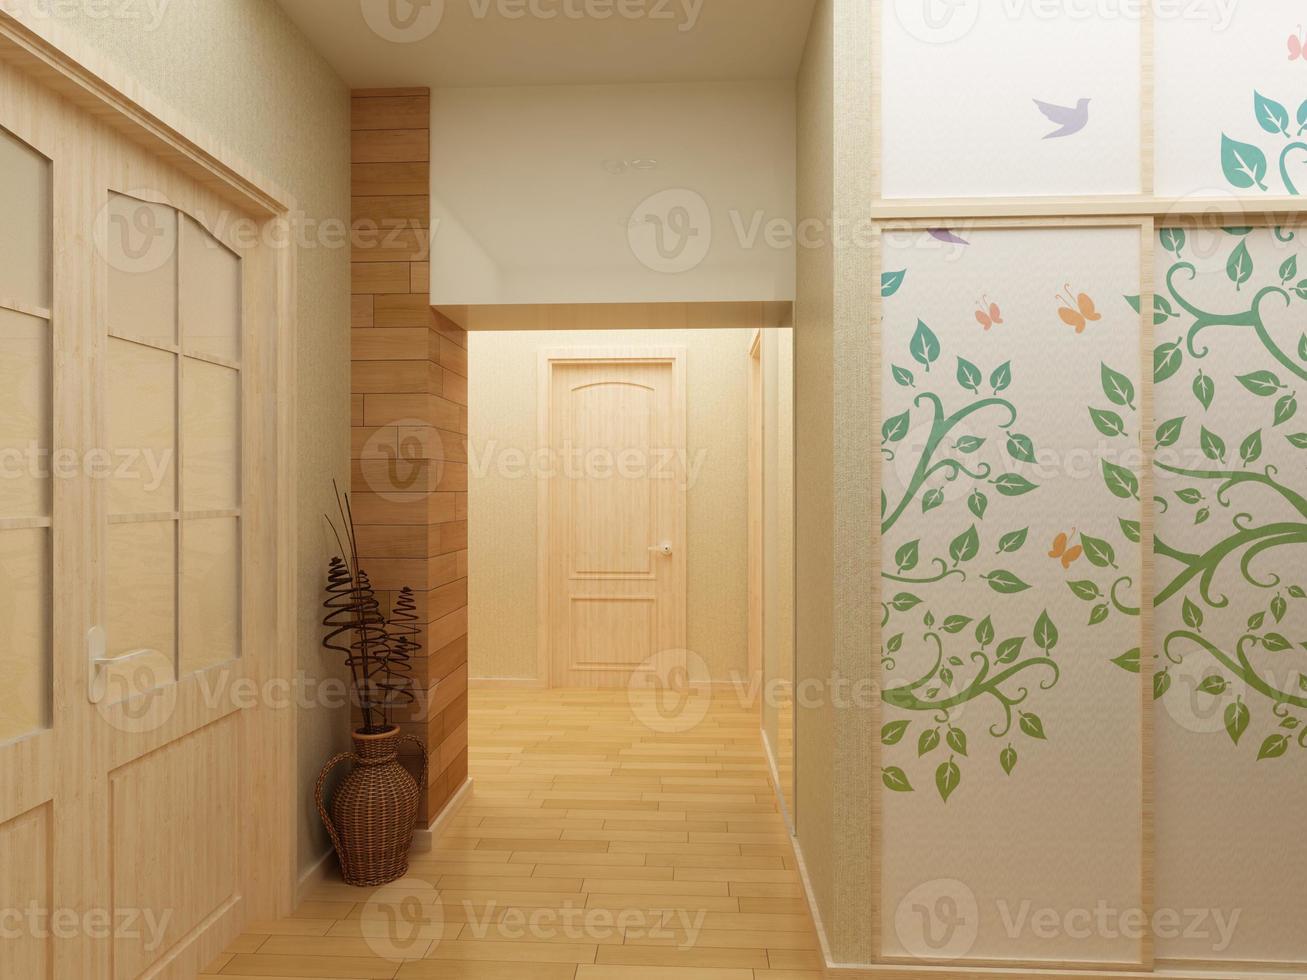 modern design interieur van hal, gang. 3D render foto